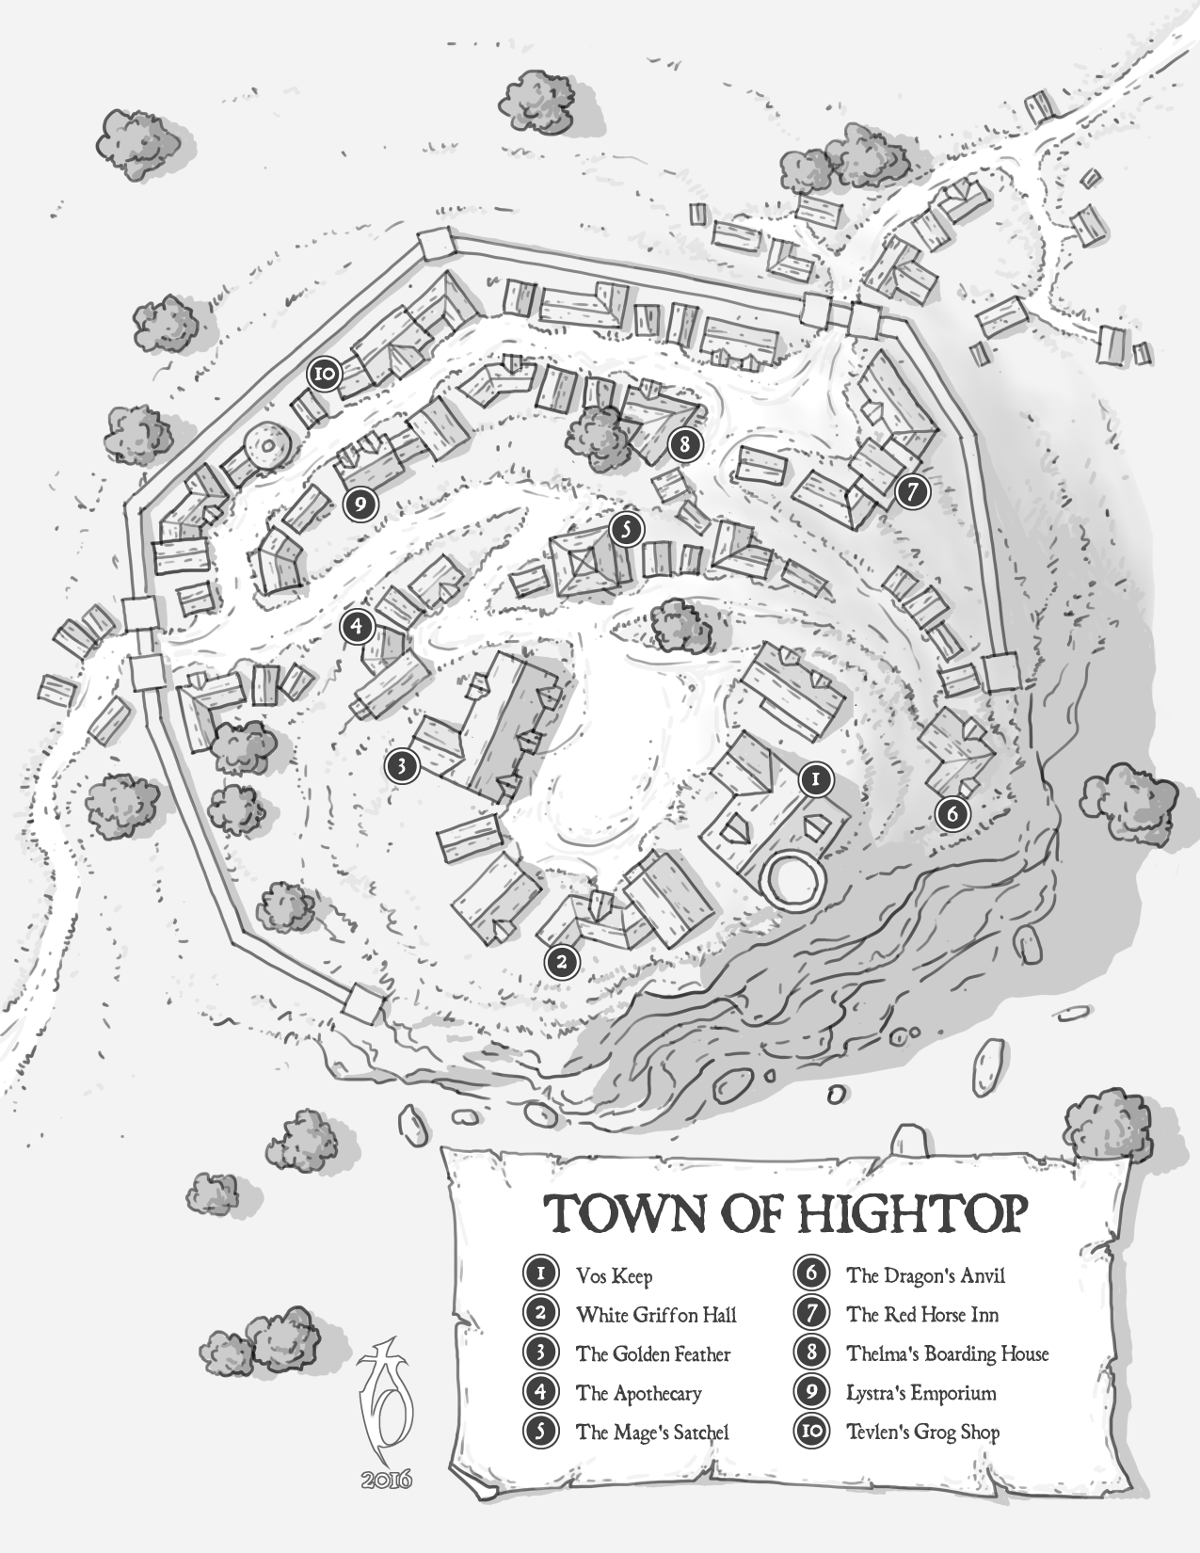 Town of Hightop by arsheesh